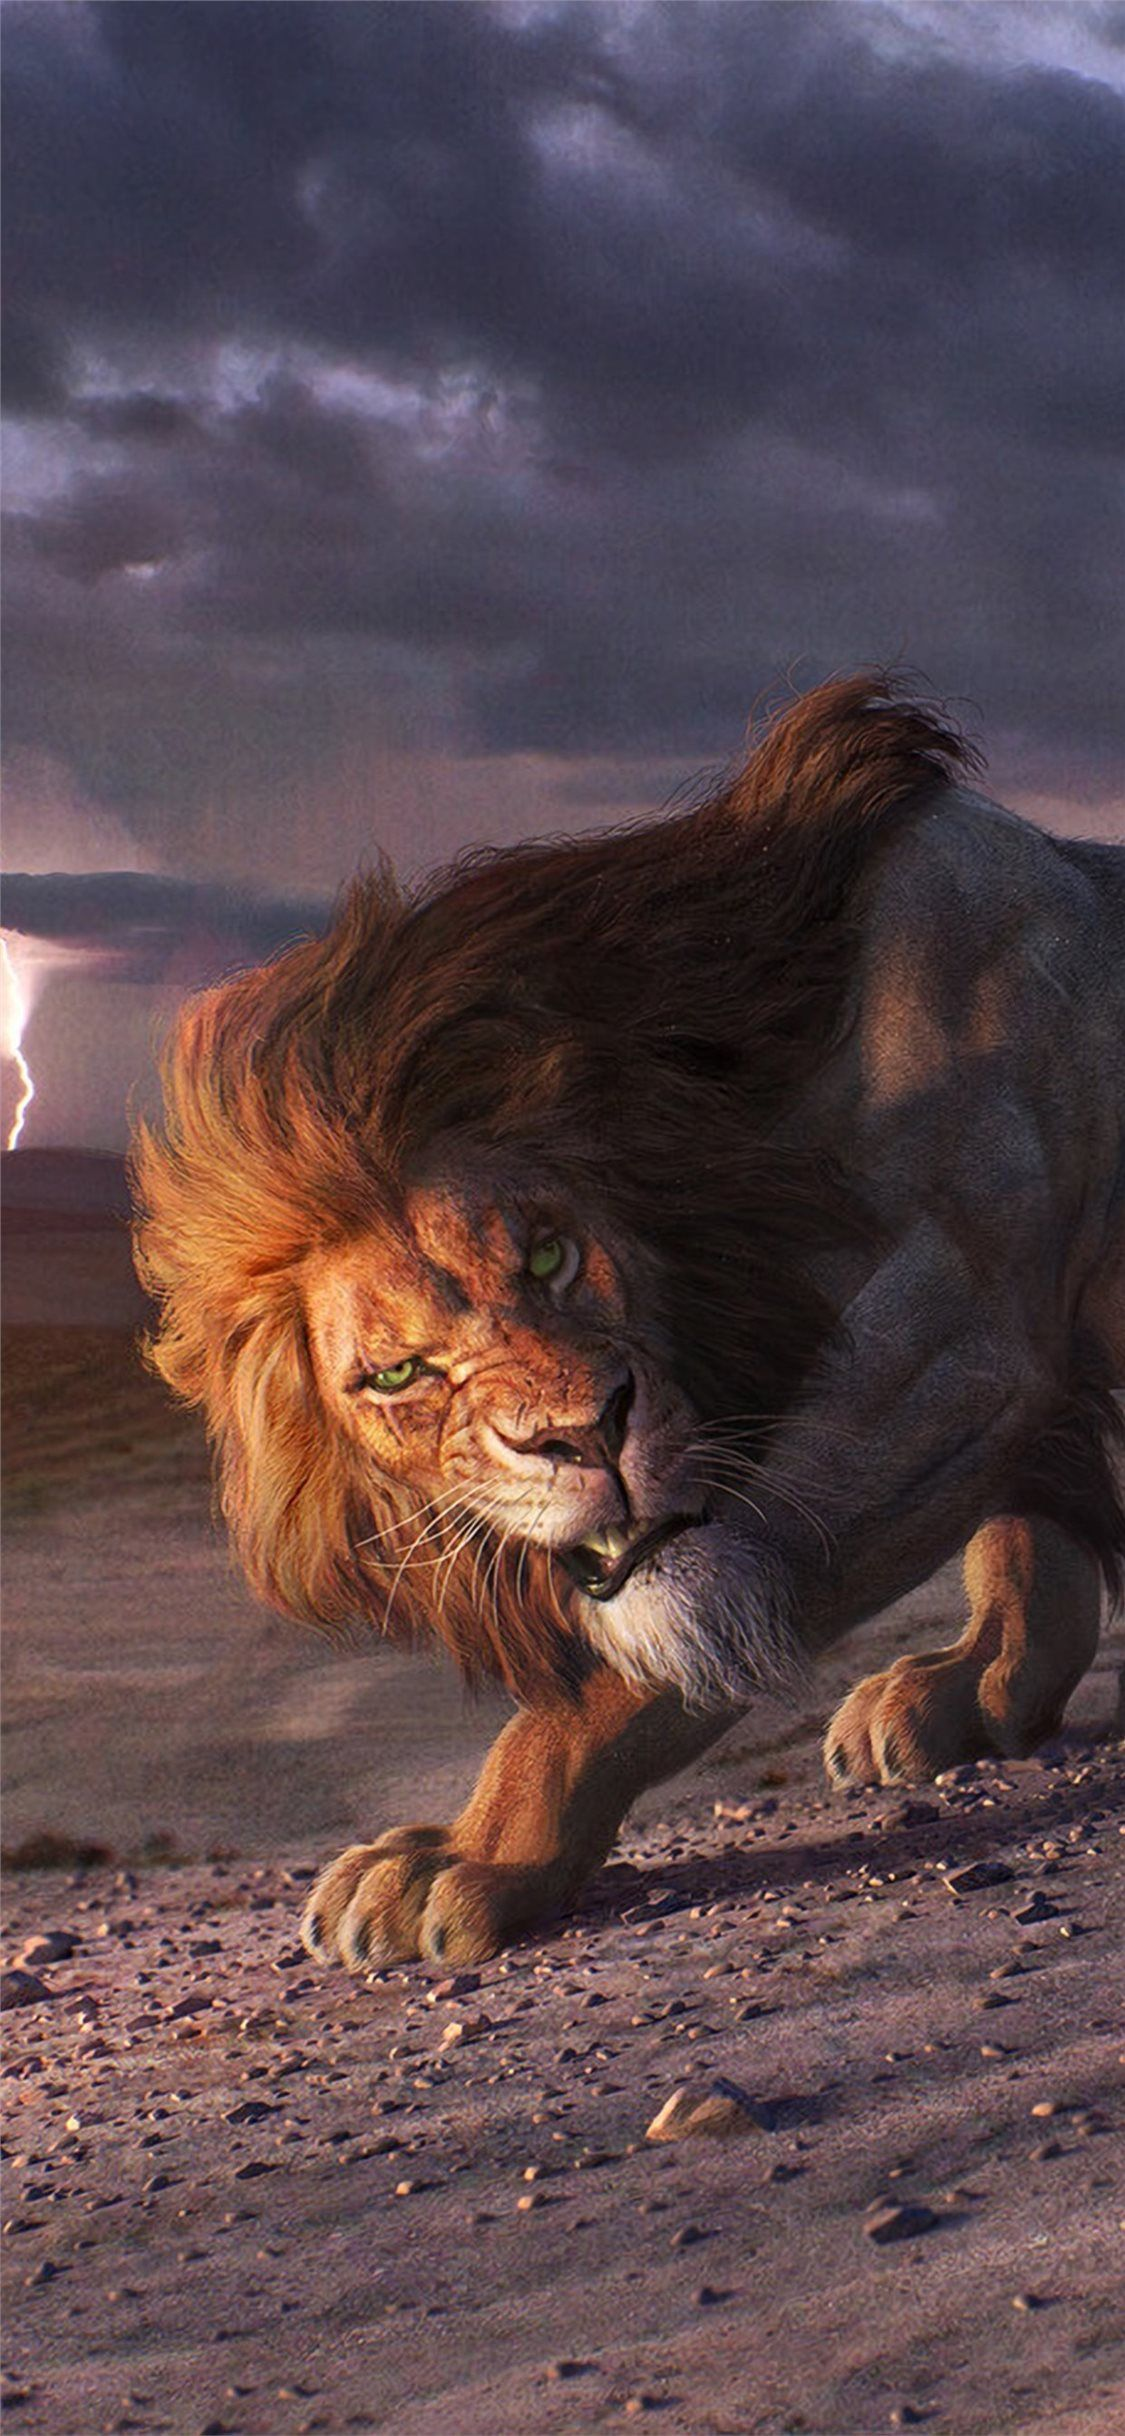 scar artwork iPhone X Wallpapers Lion pictures, Lion